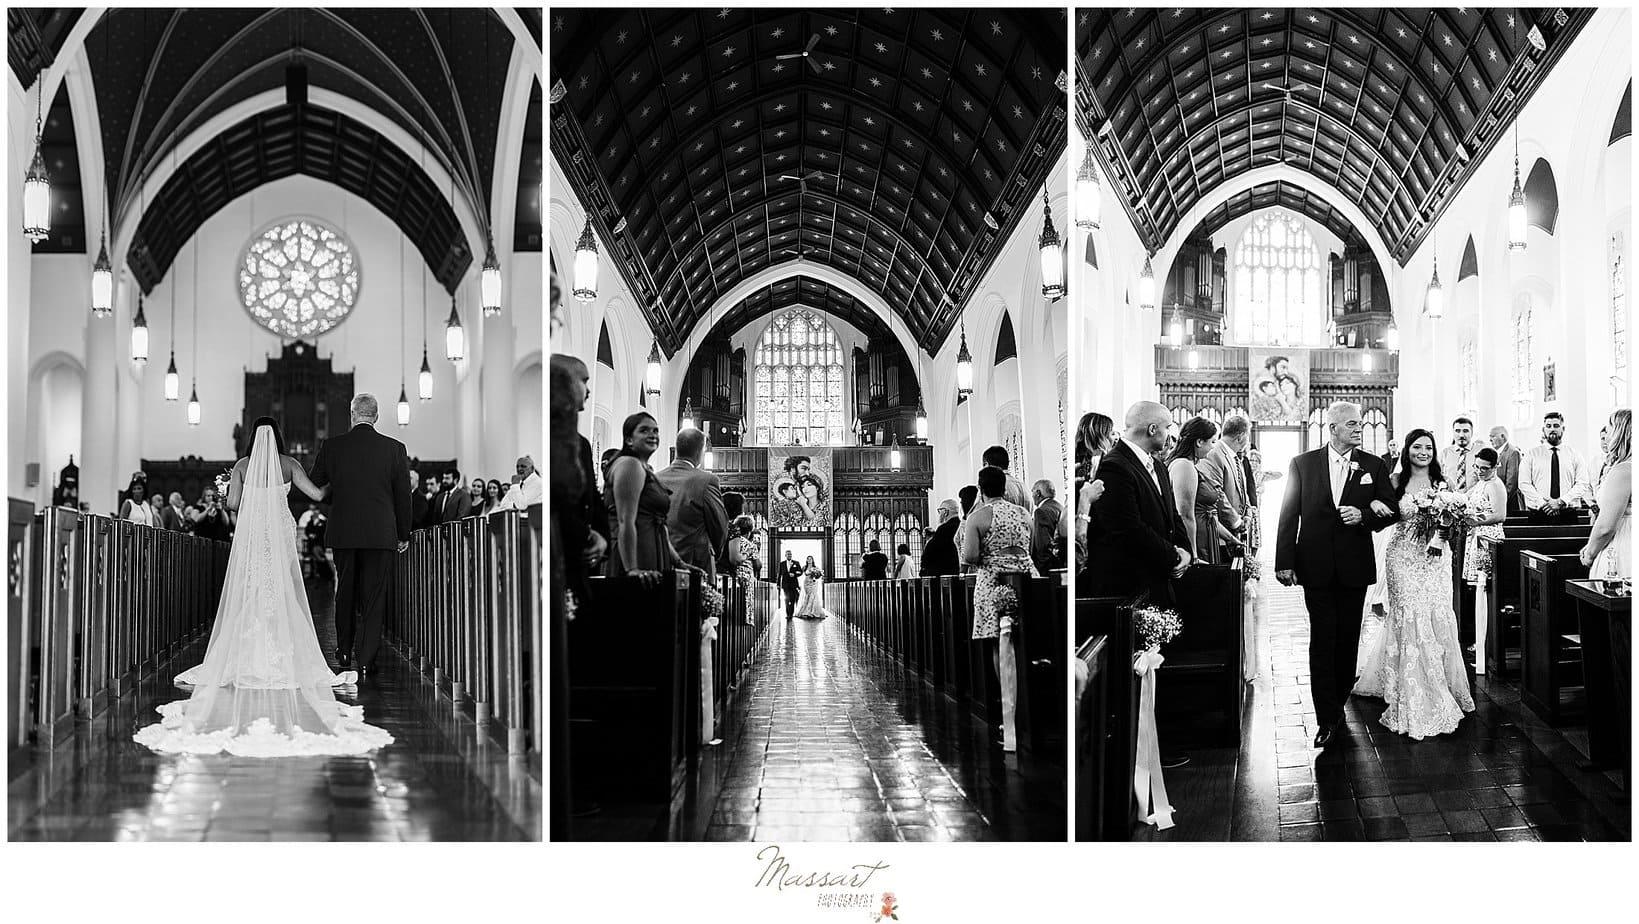 RI photographers capture bride walking down the aisle